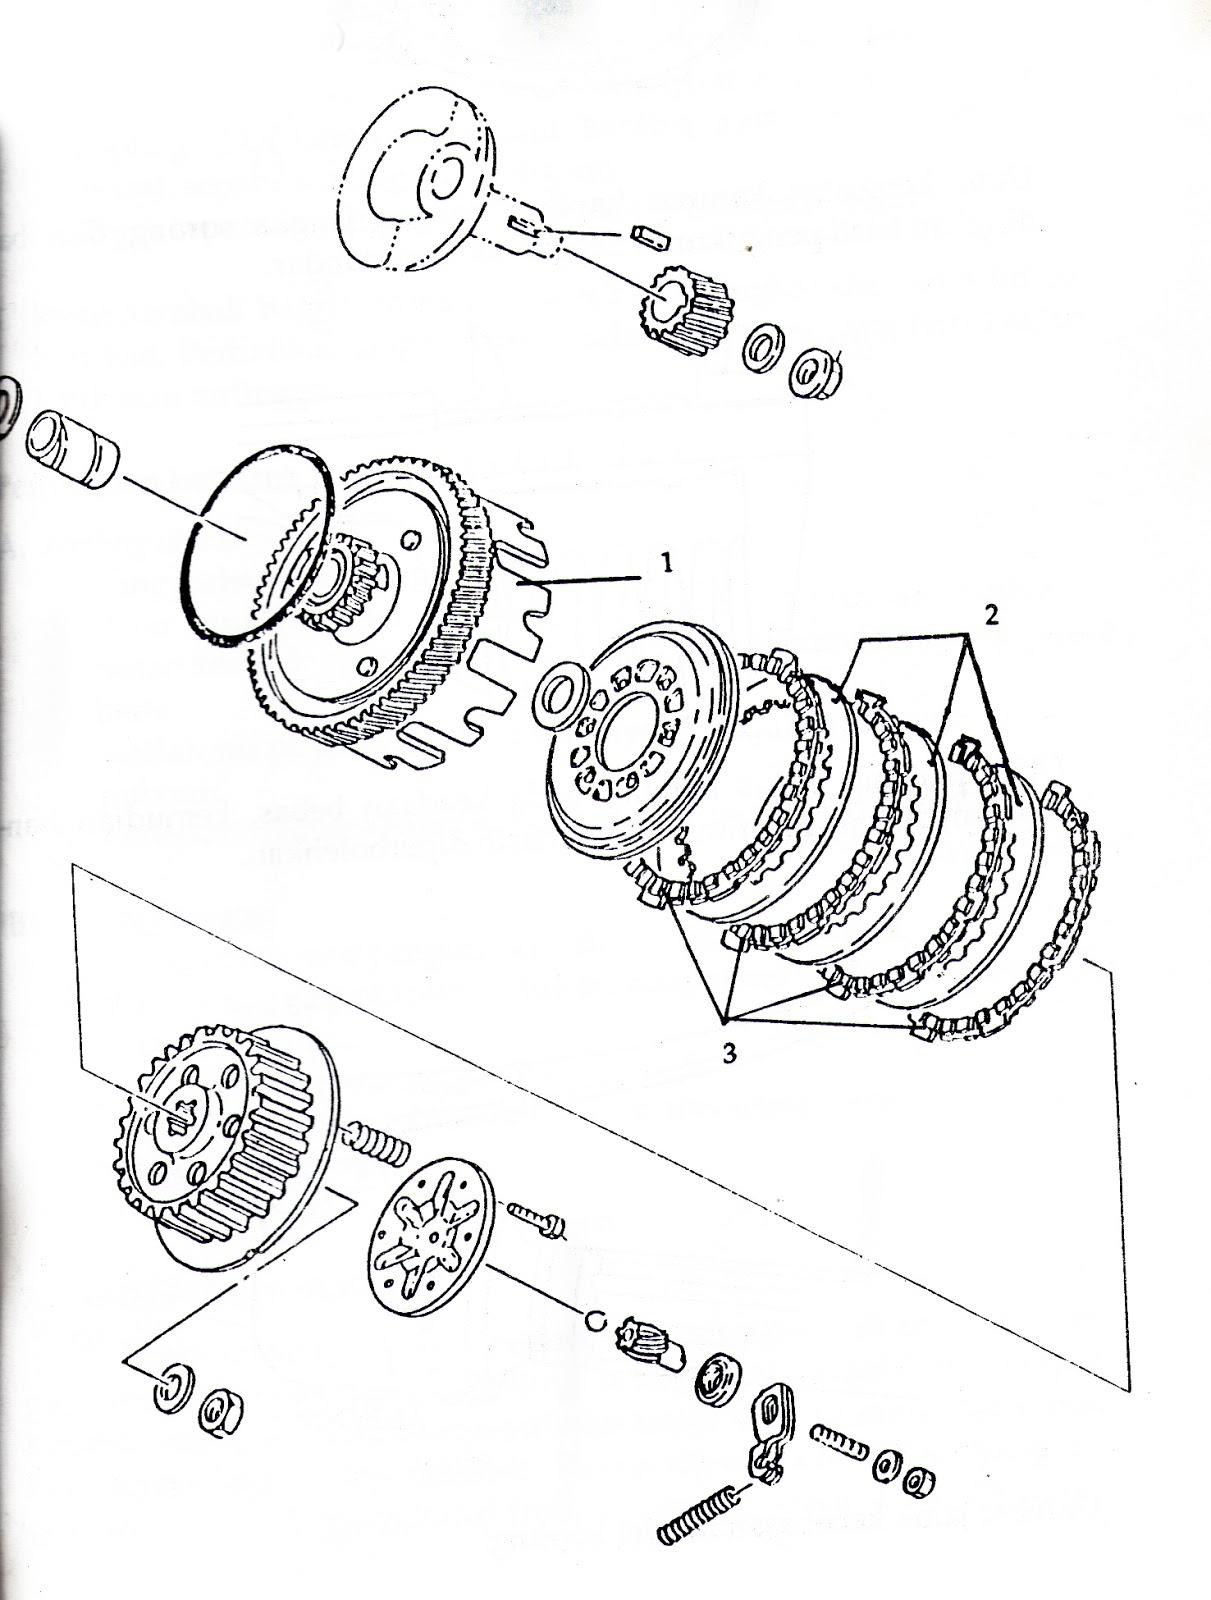 OTOMOTIF: Pemeriksaan, Penyetelan, Perawatan Kopling Manual